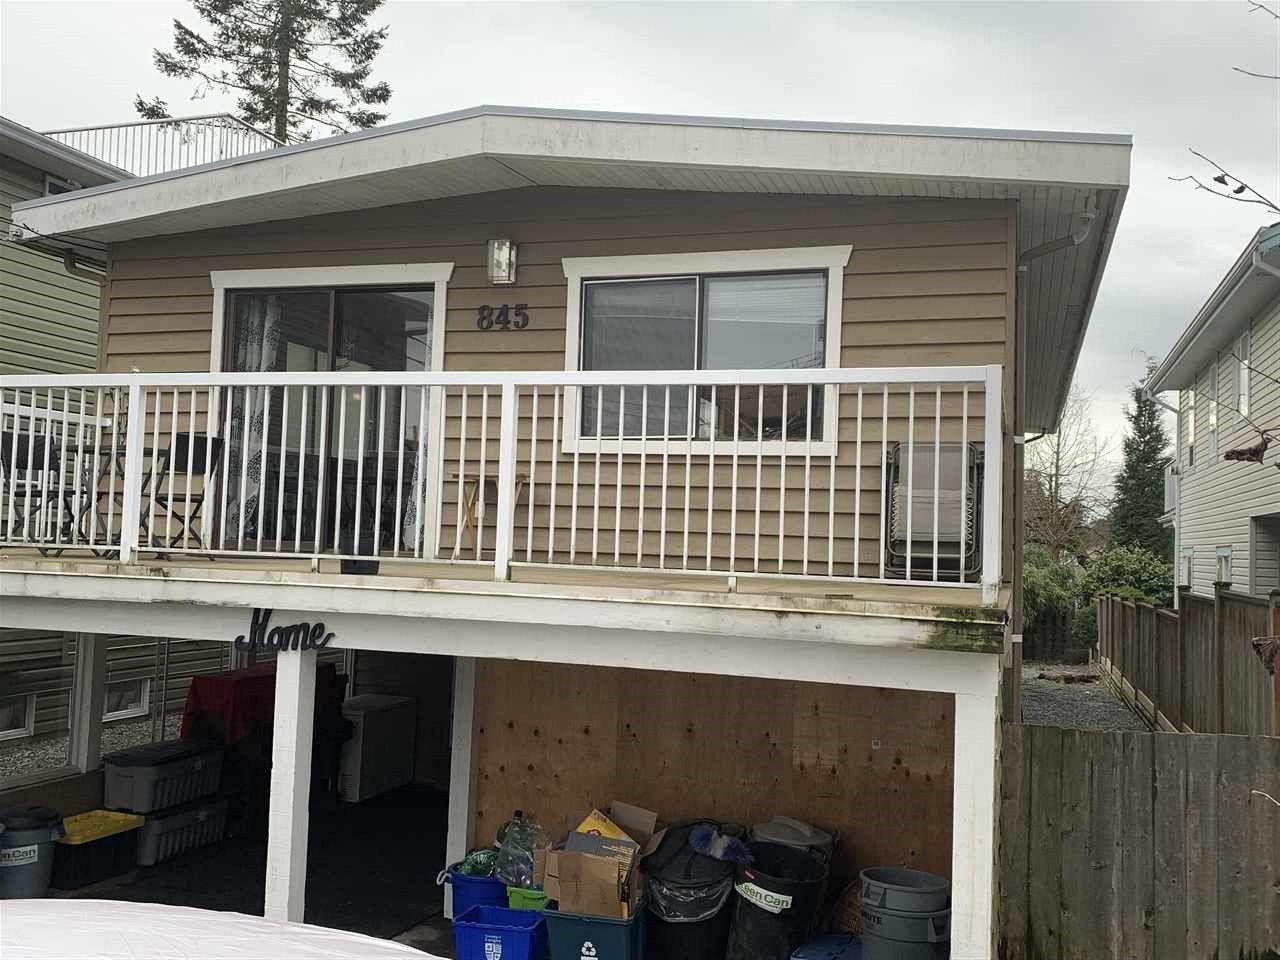 Main Photo: 845 STEVENS STREET: White Rock House for sale (South Surrey White Rock)  : MLS®# R2540979